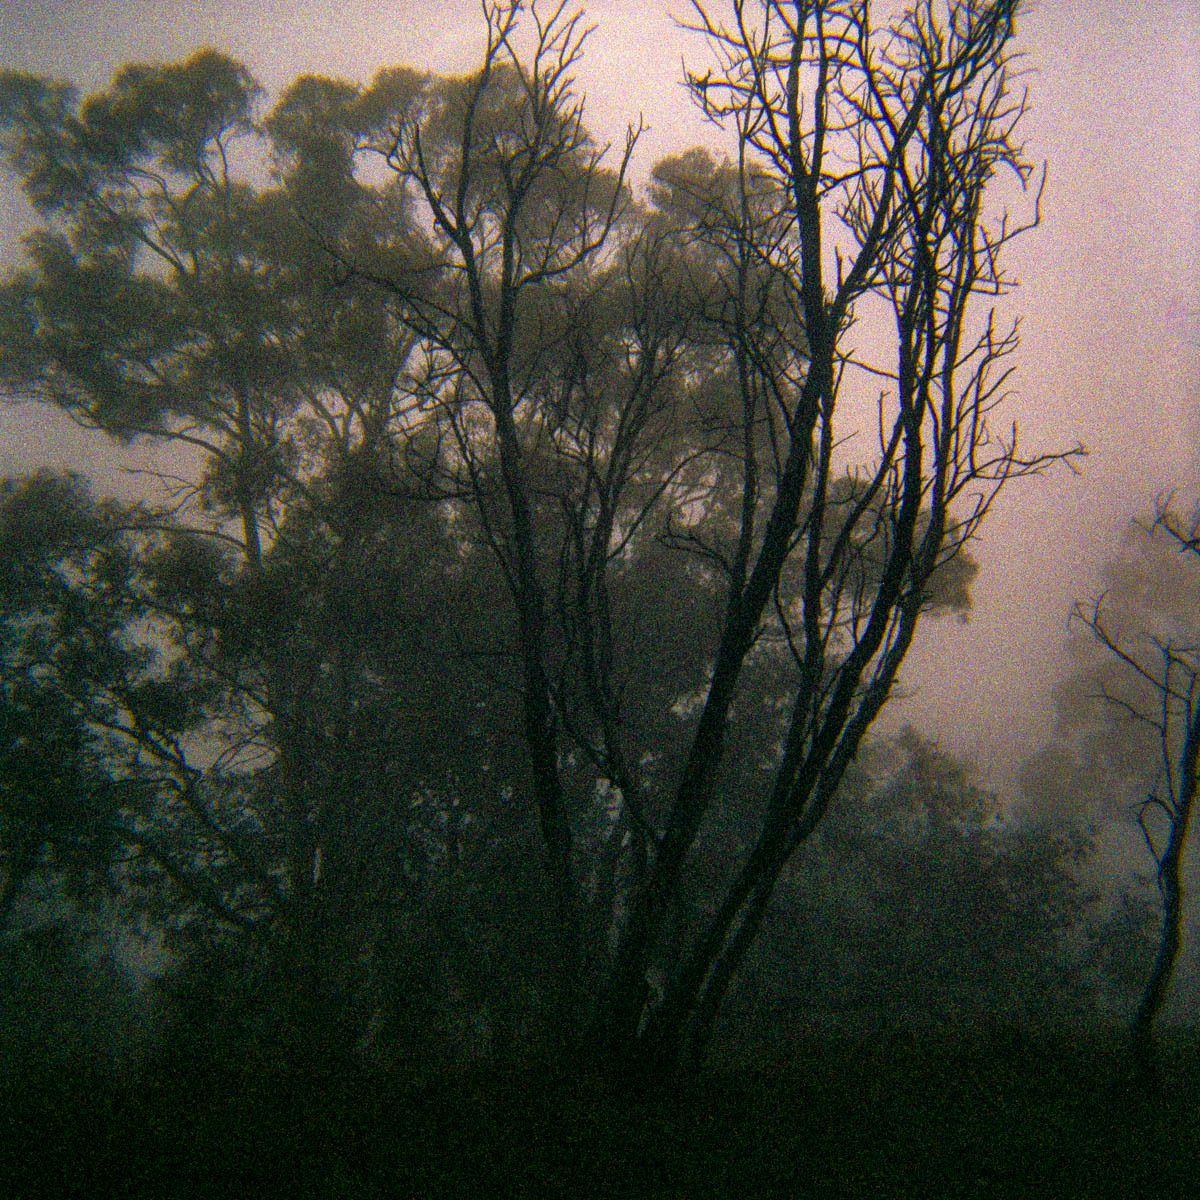 Canberra, Australia, Trees in Fog 1, 2015